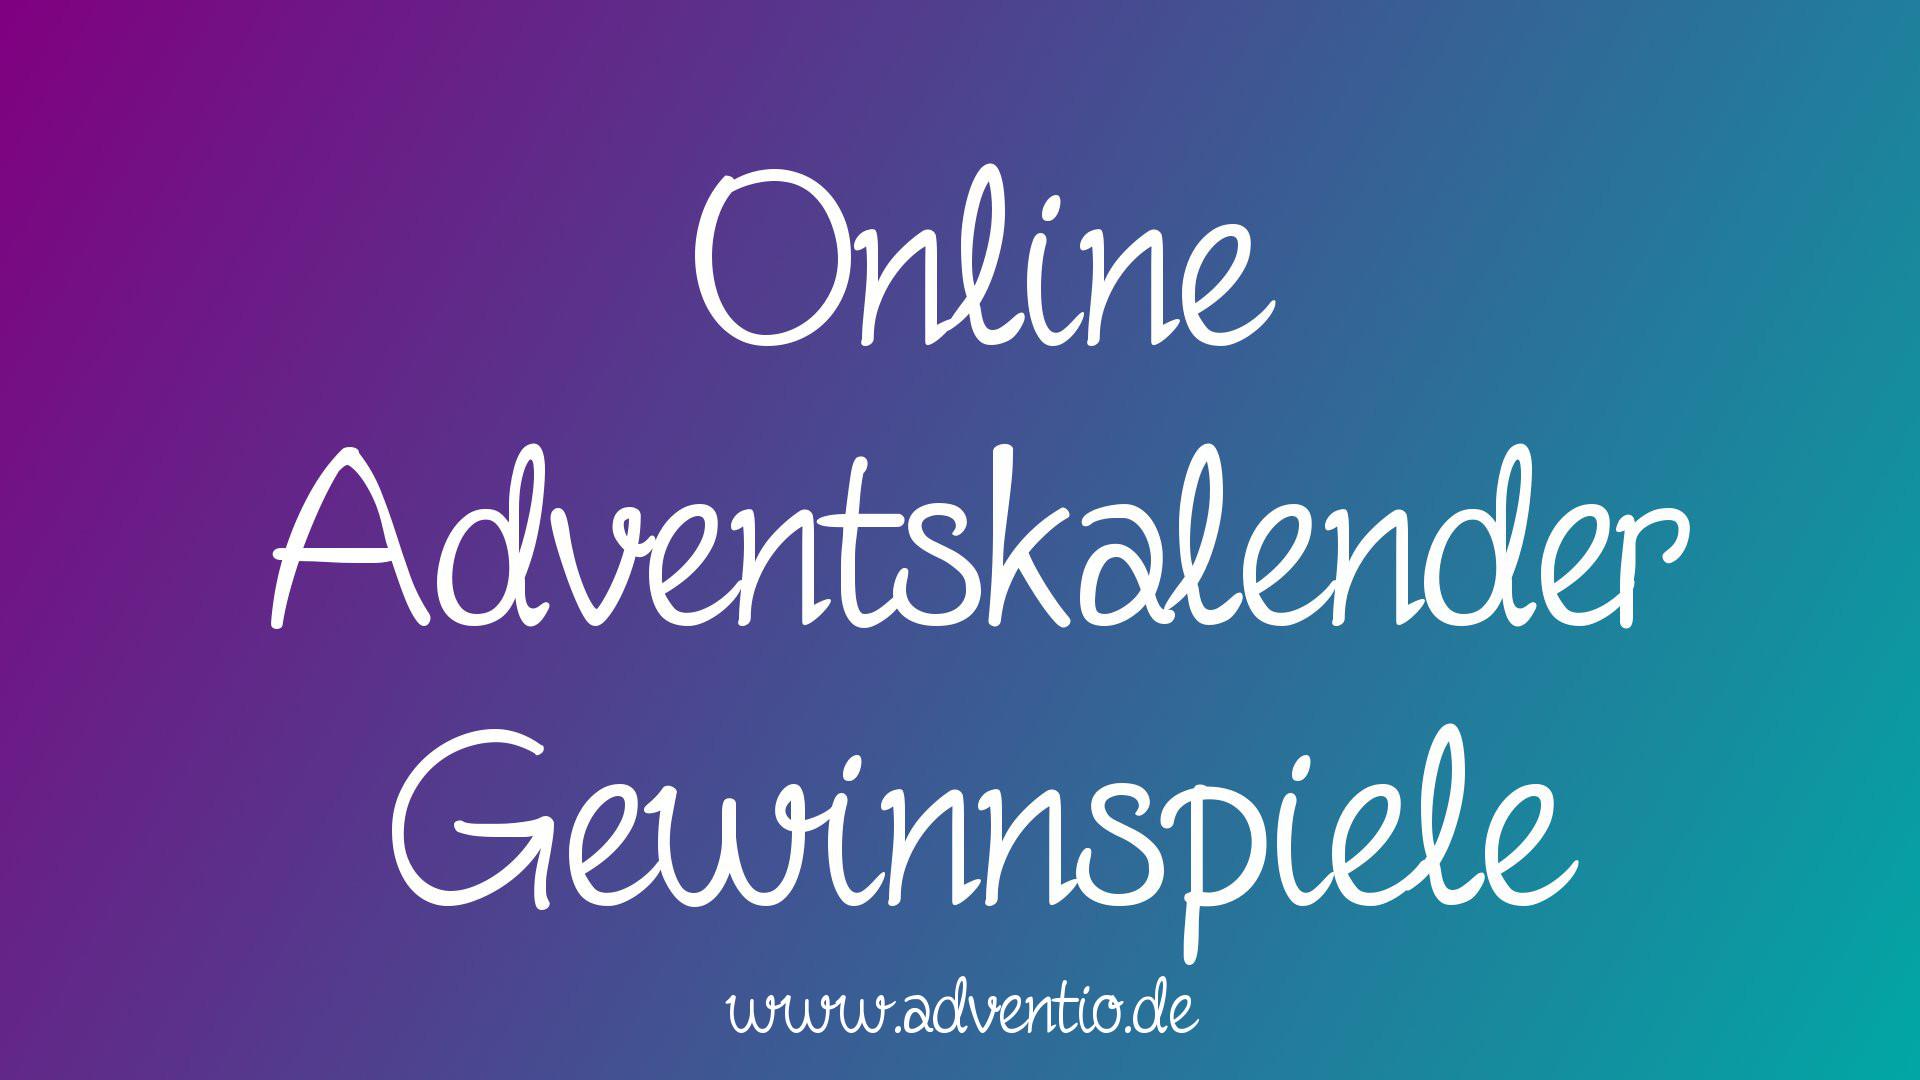 Online Adventskalender Gewinnspiele